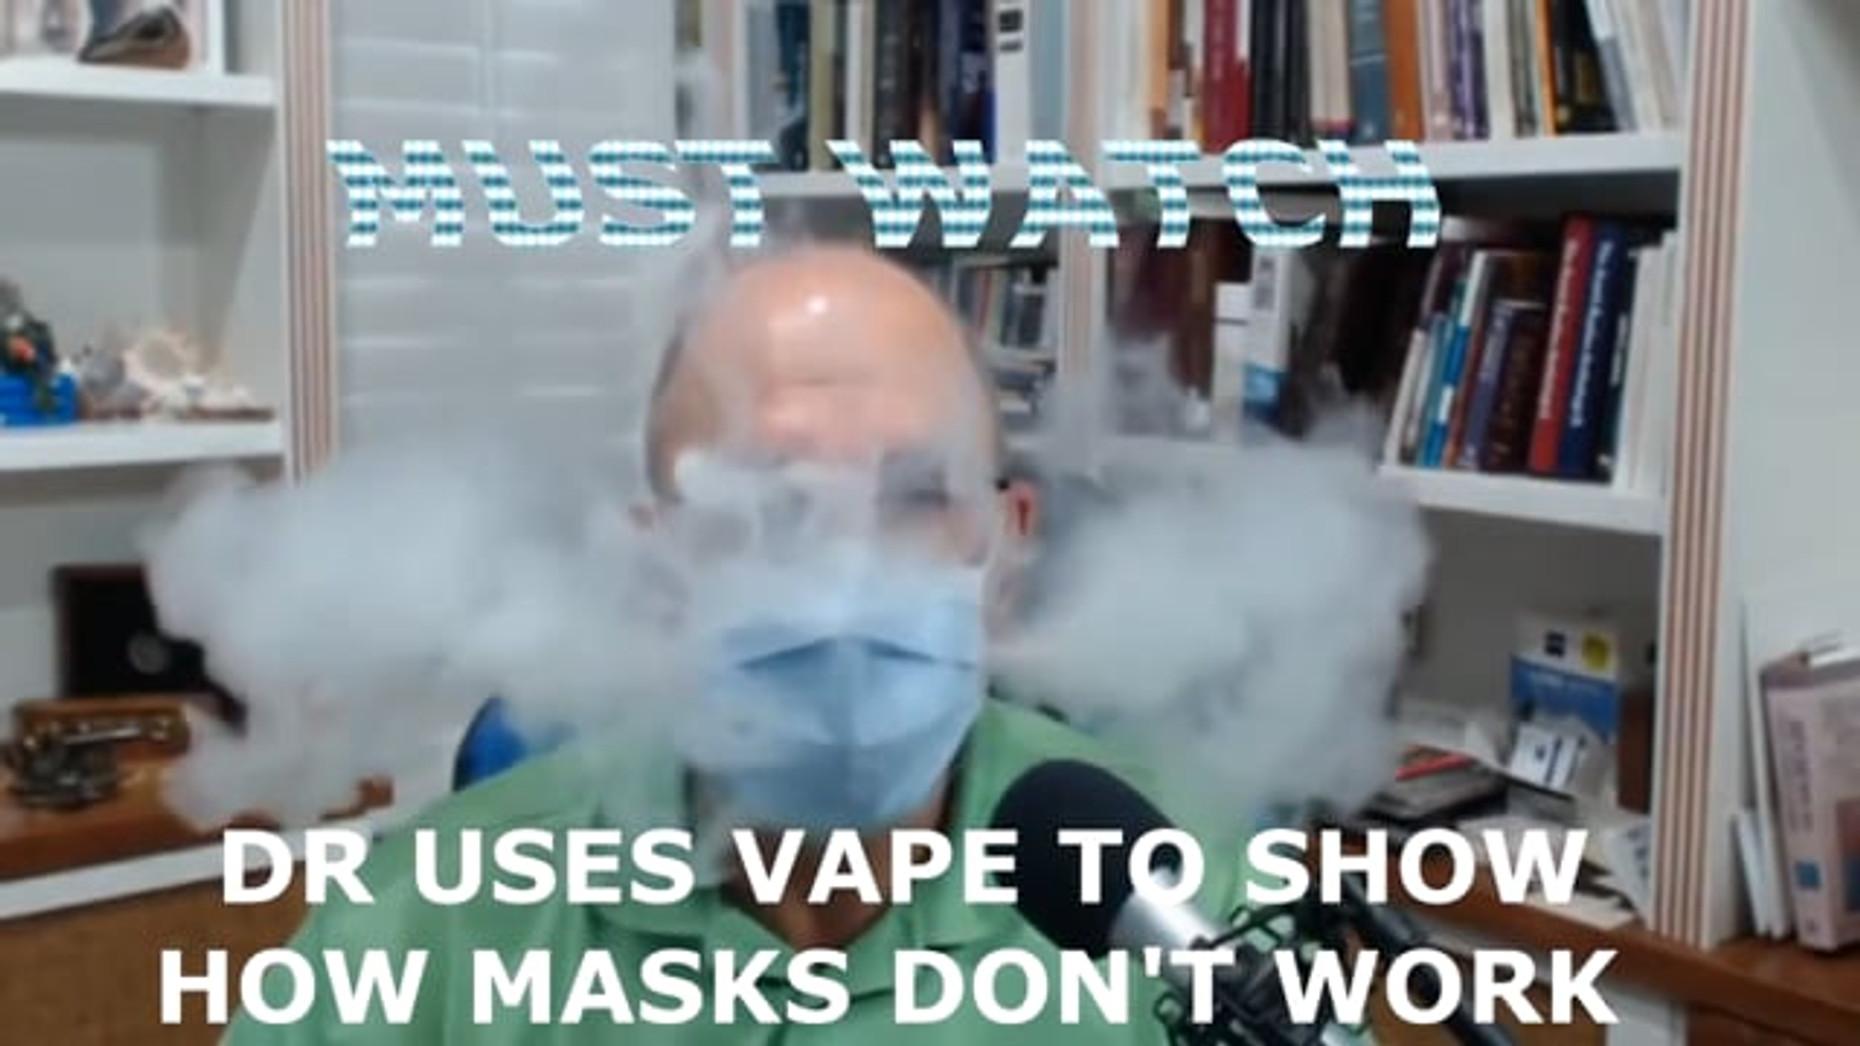 Masks Don't Work